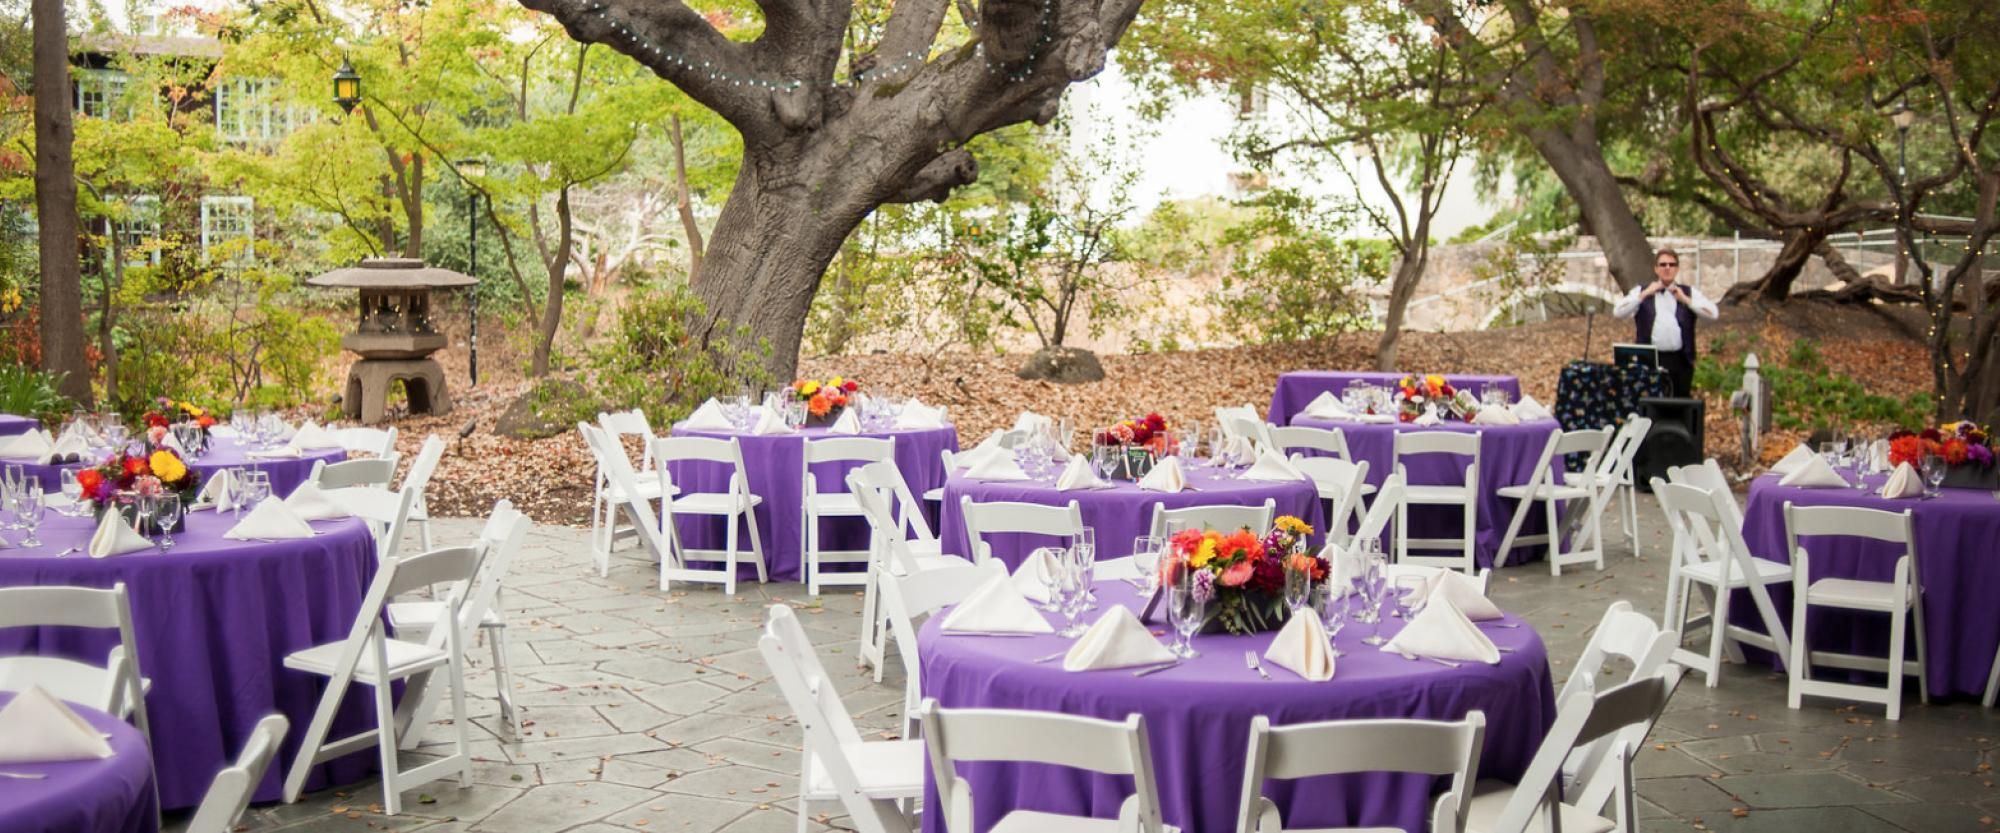 April 1, 2015 - 10:58am - AH_Weddings_rotator_slideshow